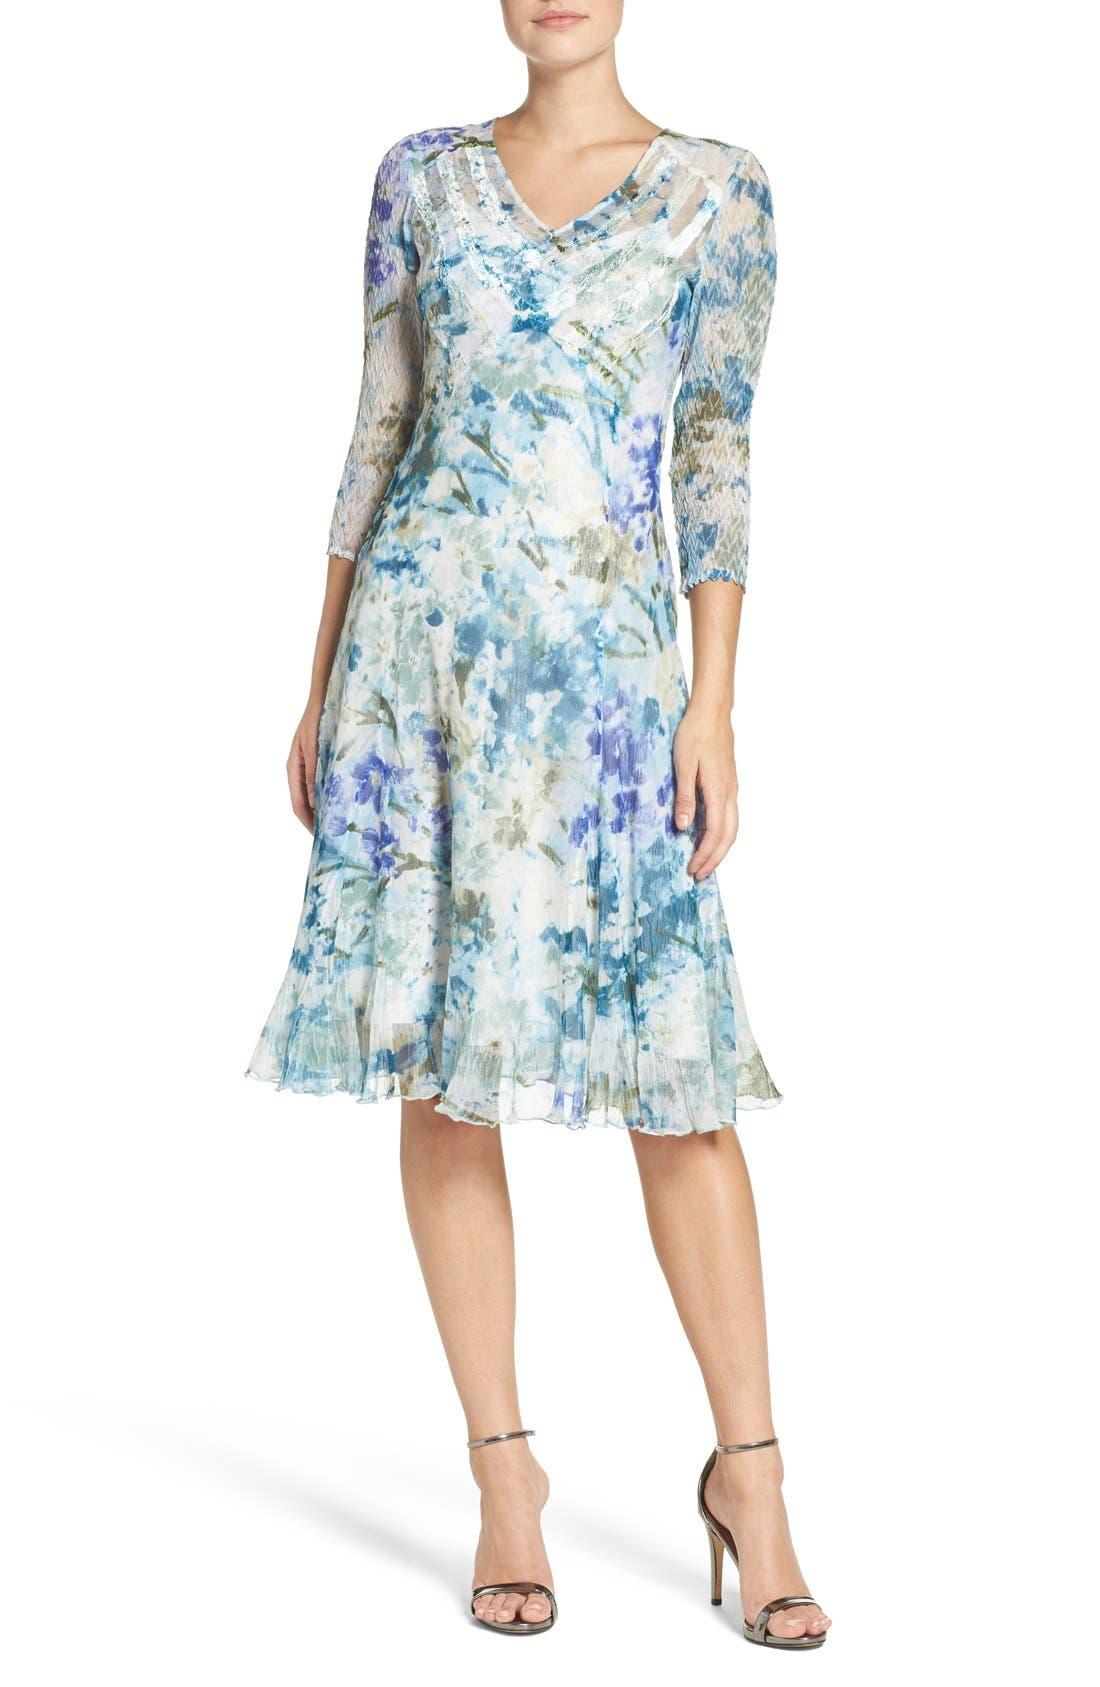 Alternate Image 1 Selected - Komarov Chiffon A-Line Dress (Regular & Petite)